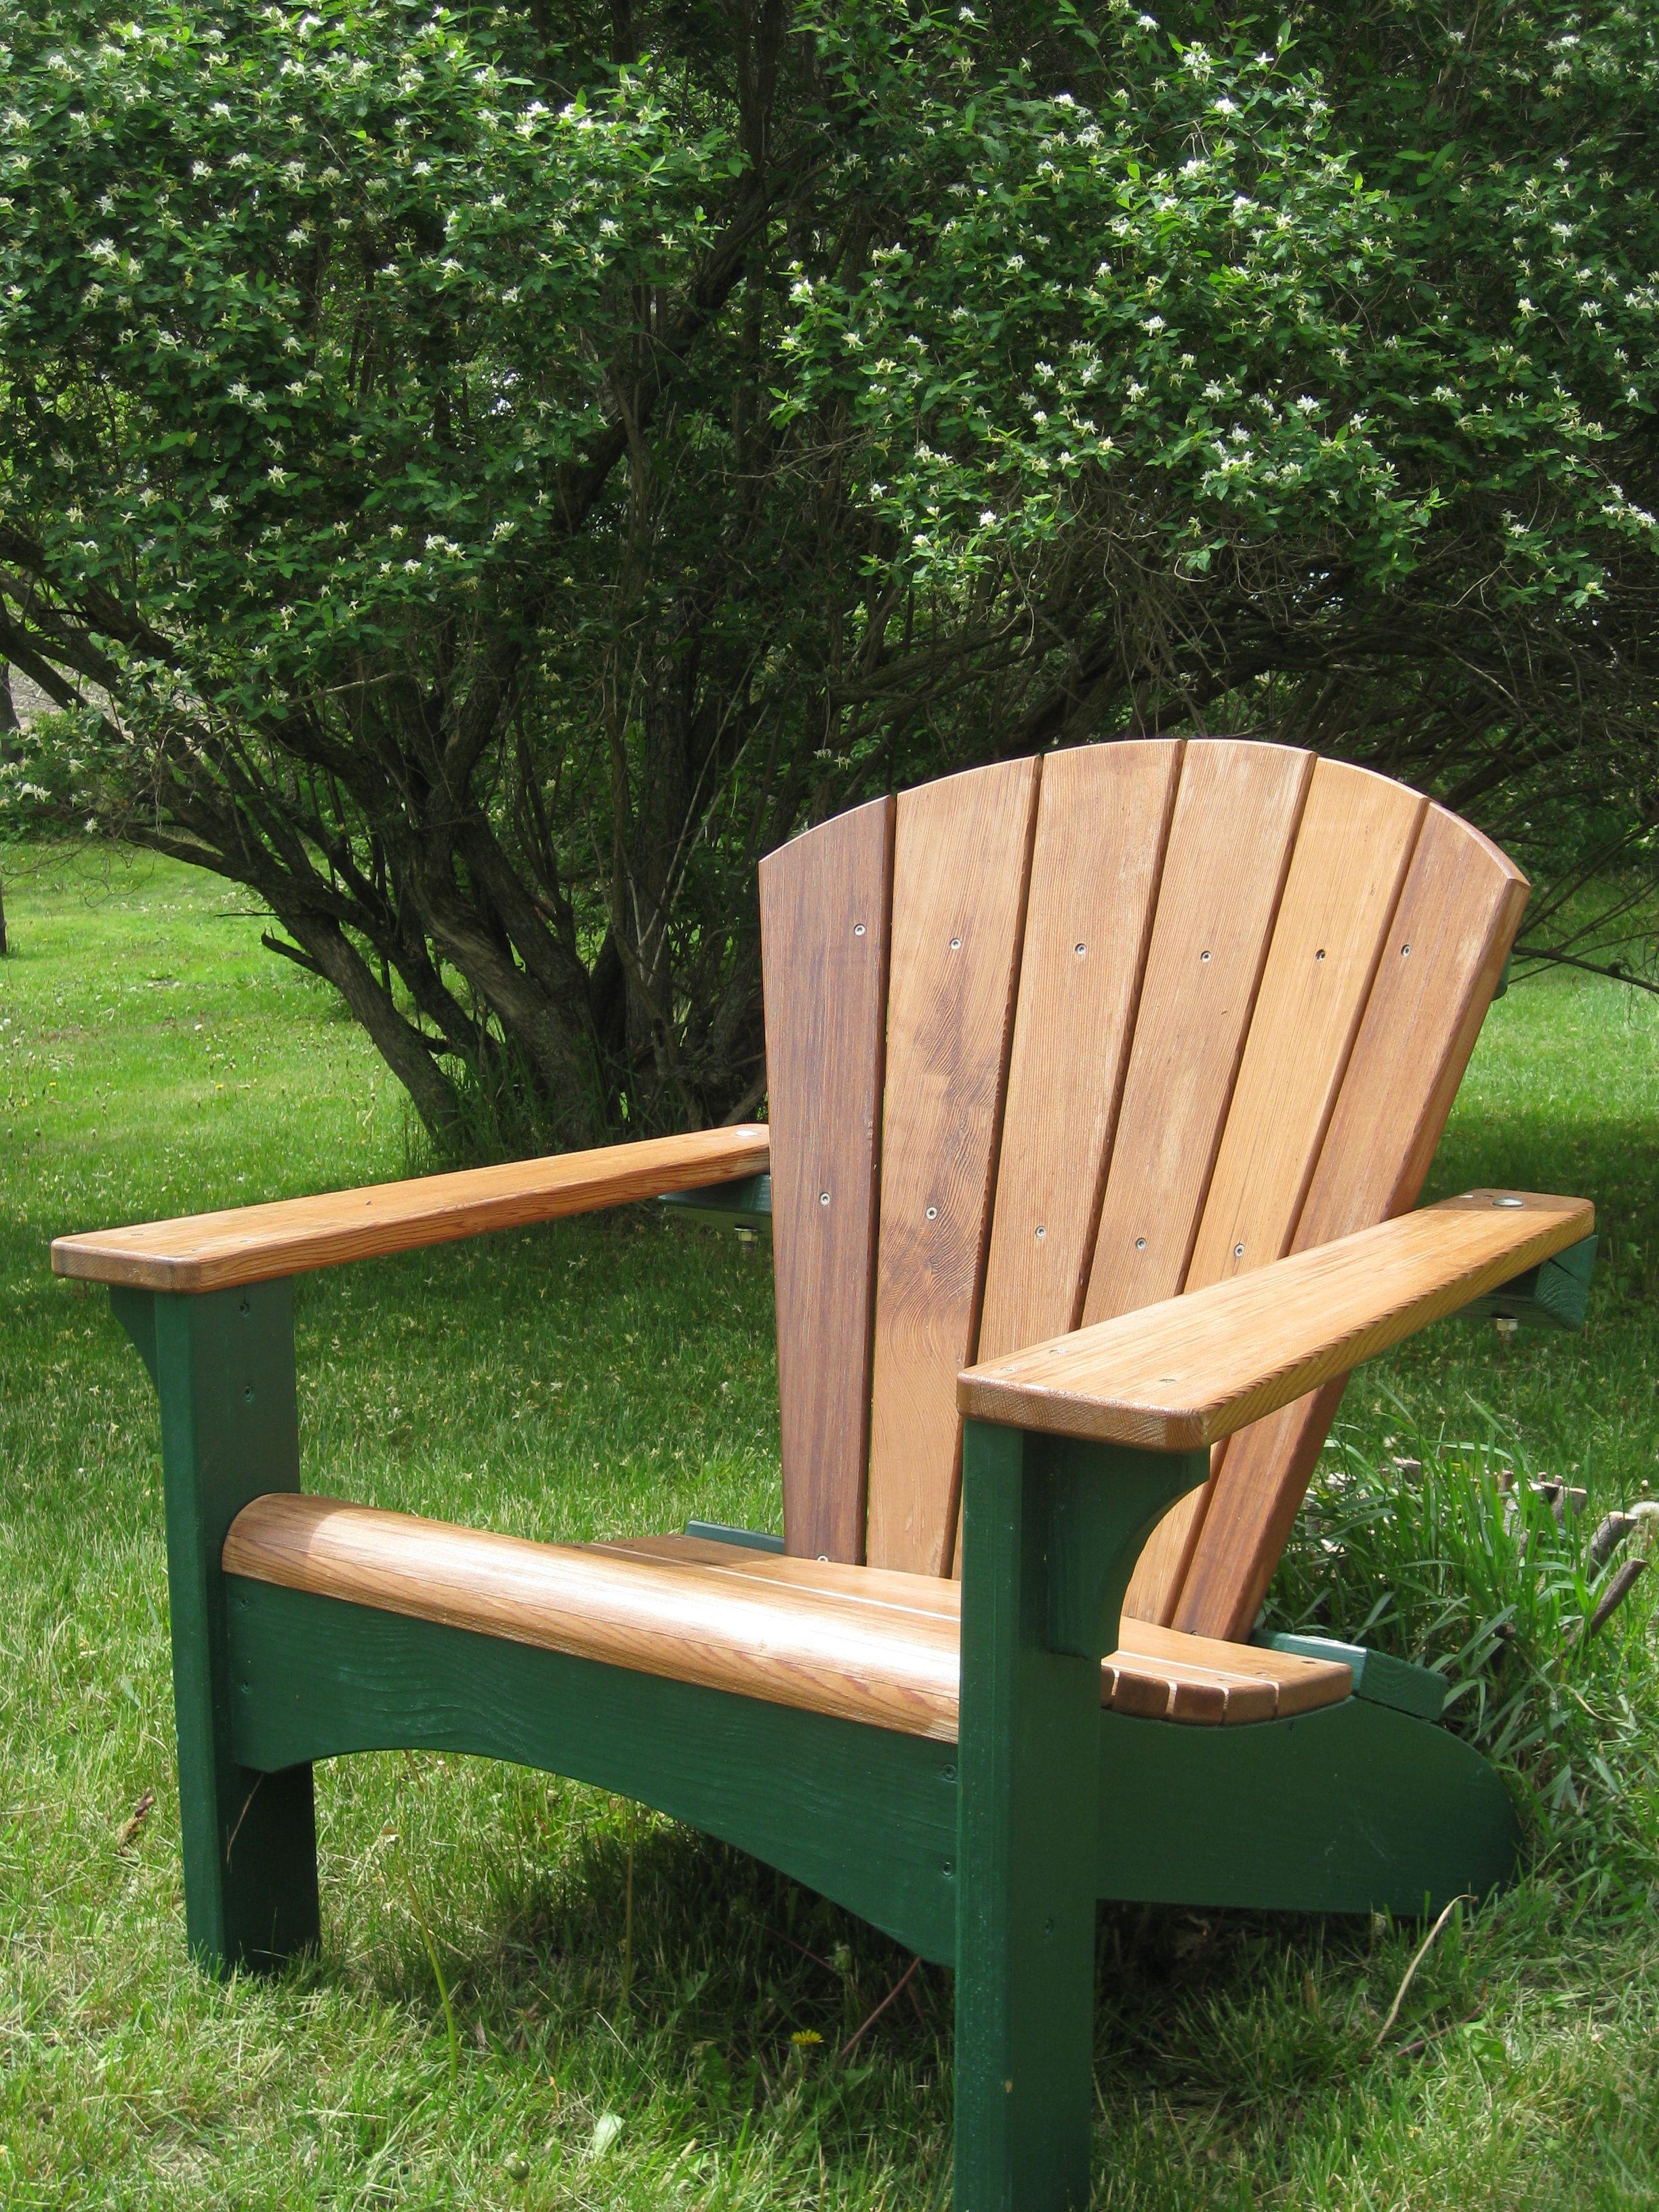 Diy redwood adirondack ready to relax adirondak chairs